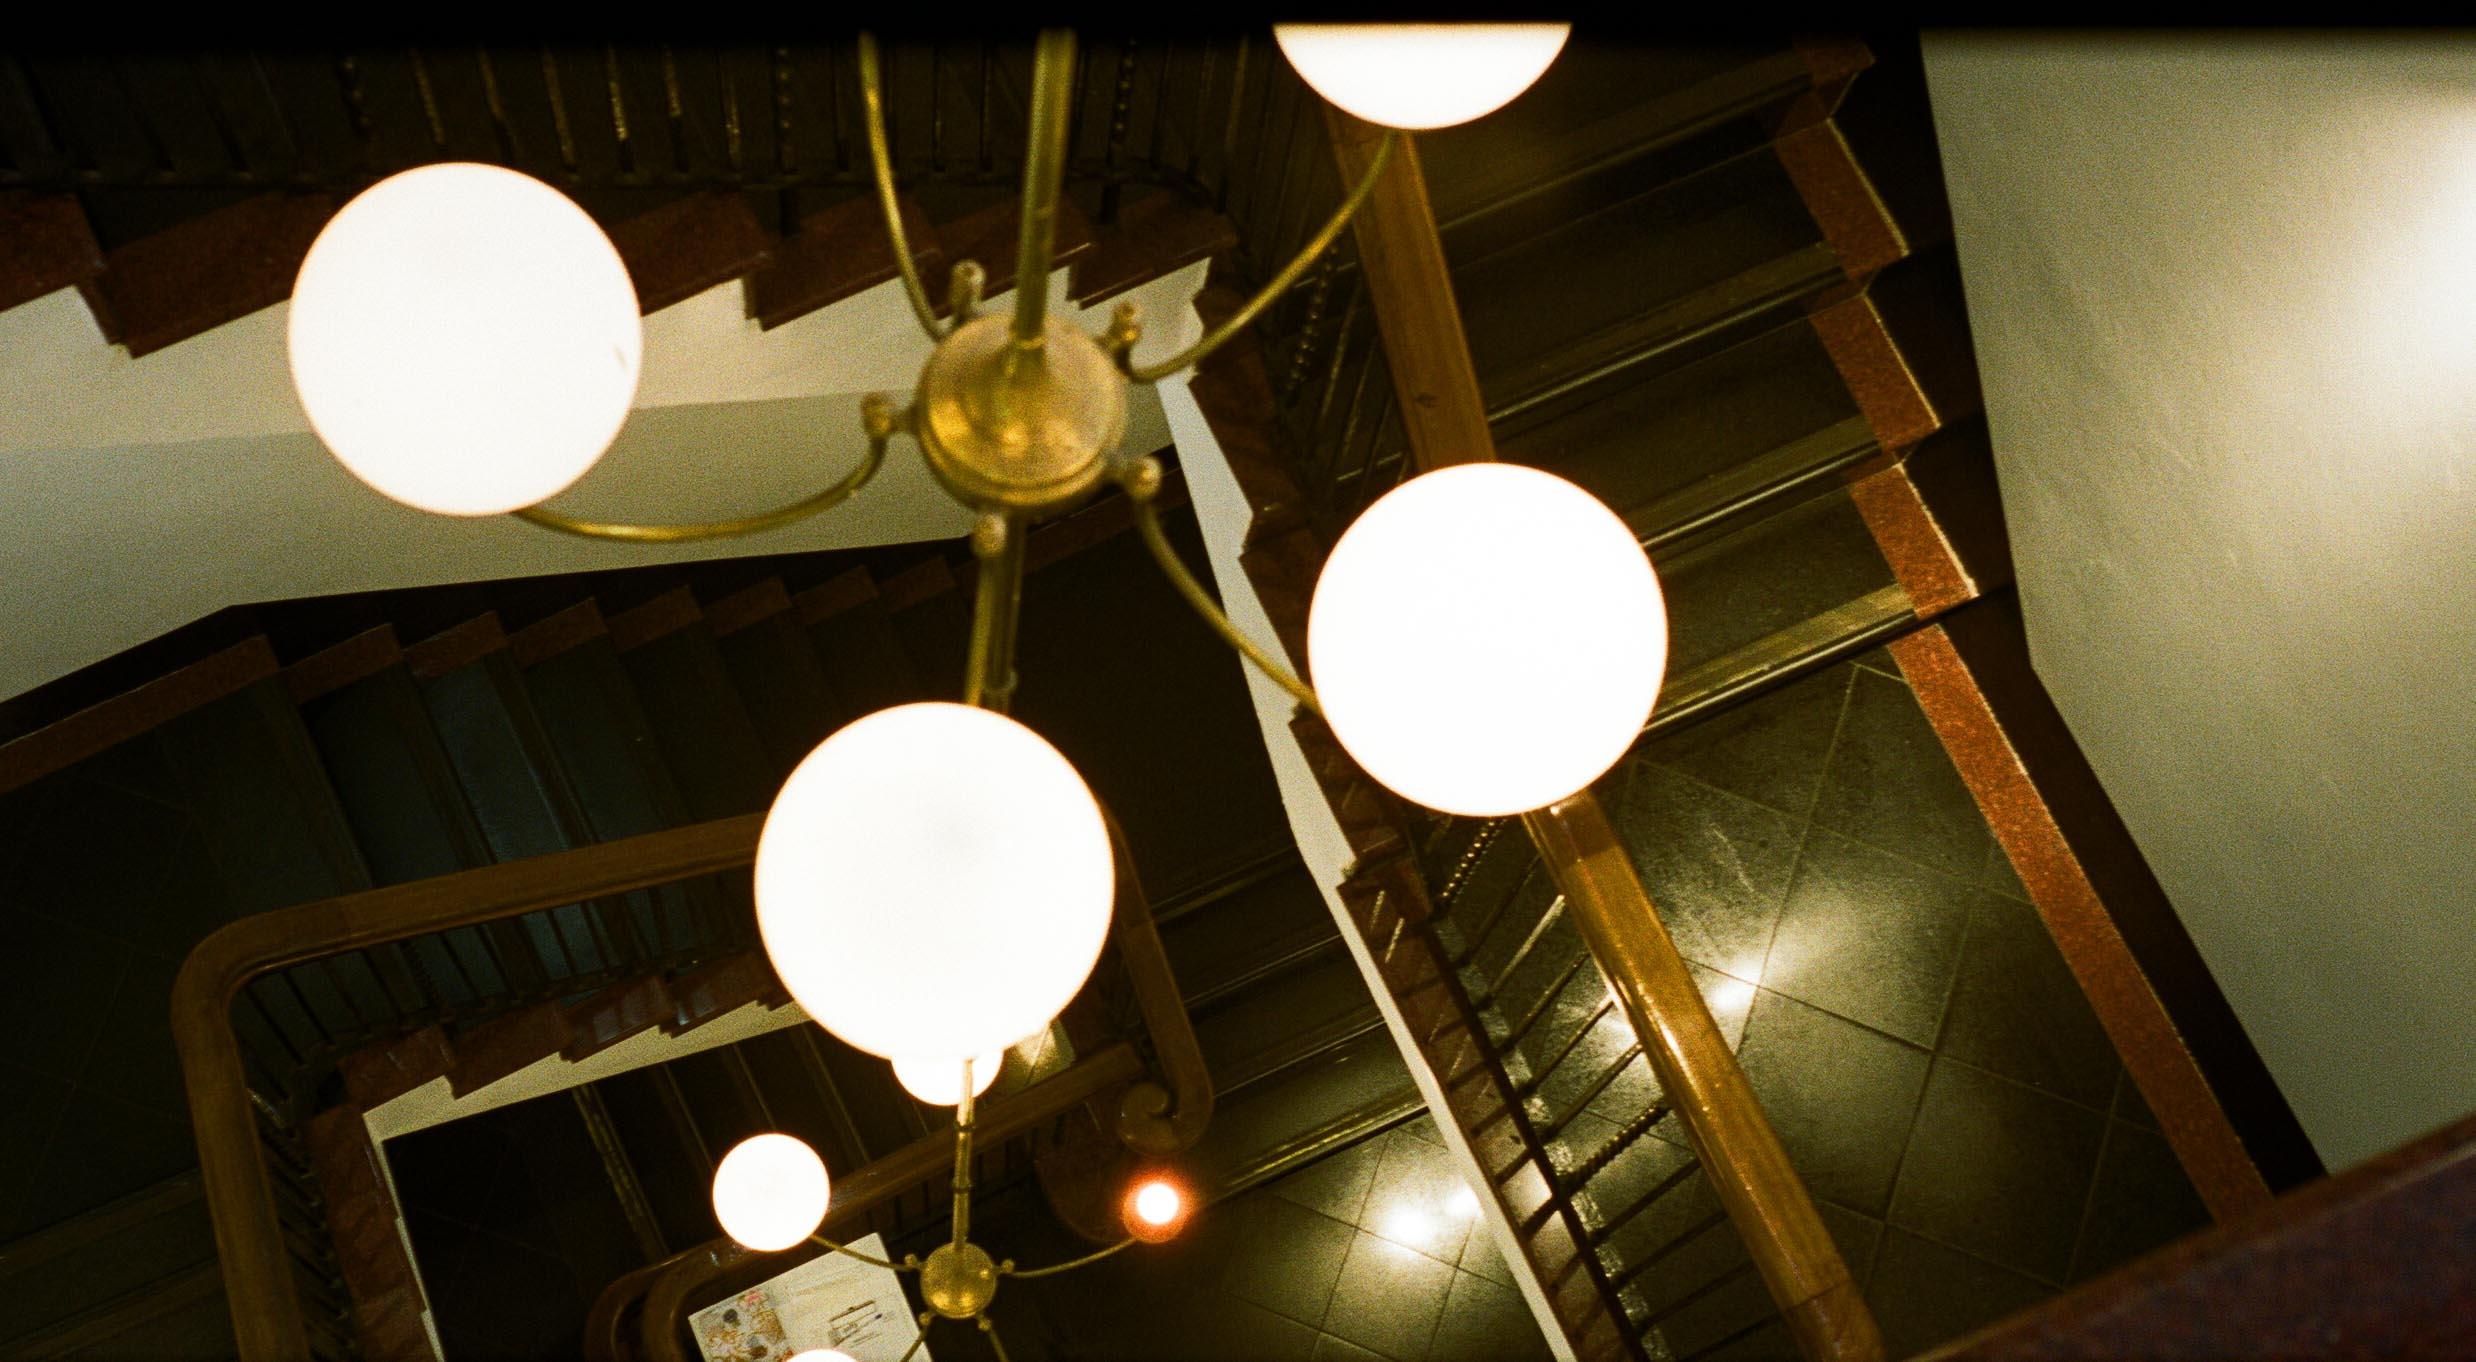 GAFFALIGHTS35MM-tumb1.jpg